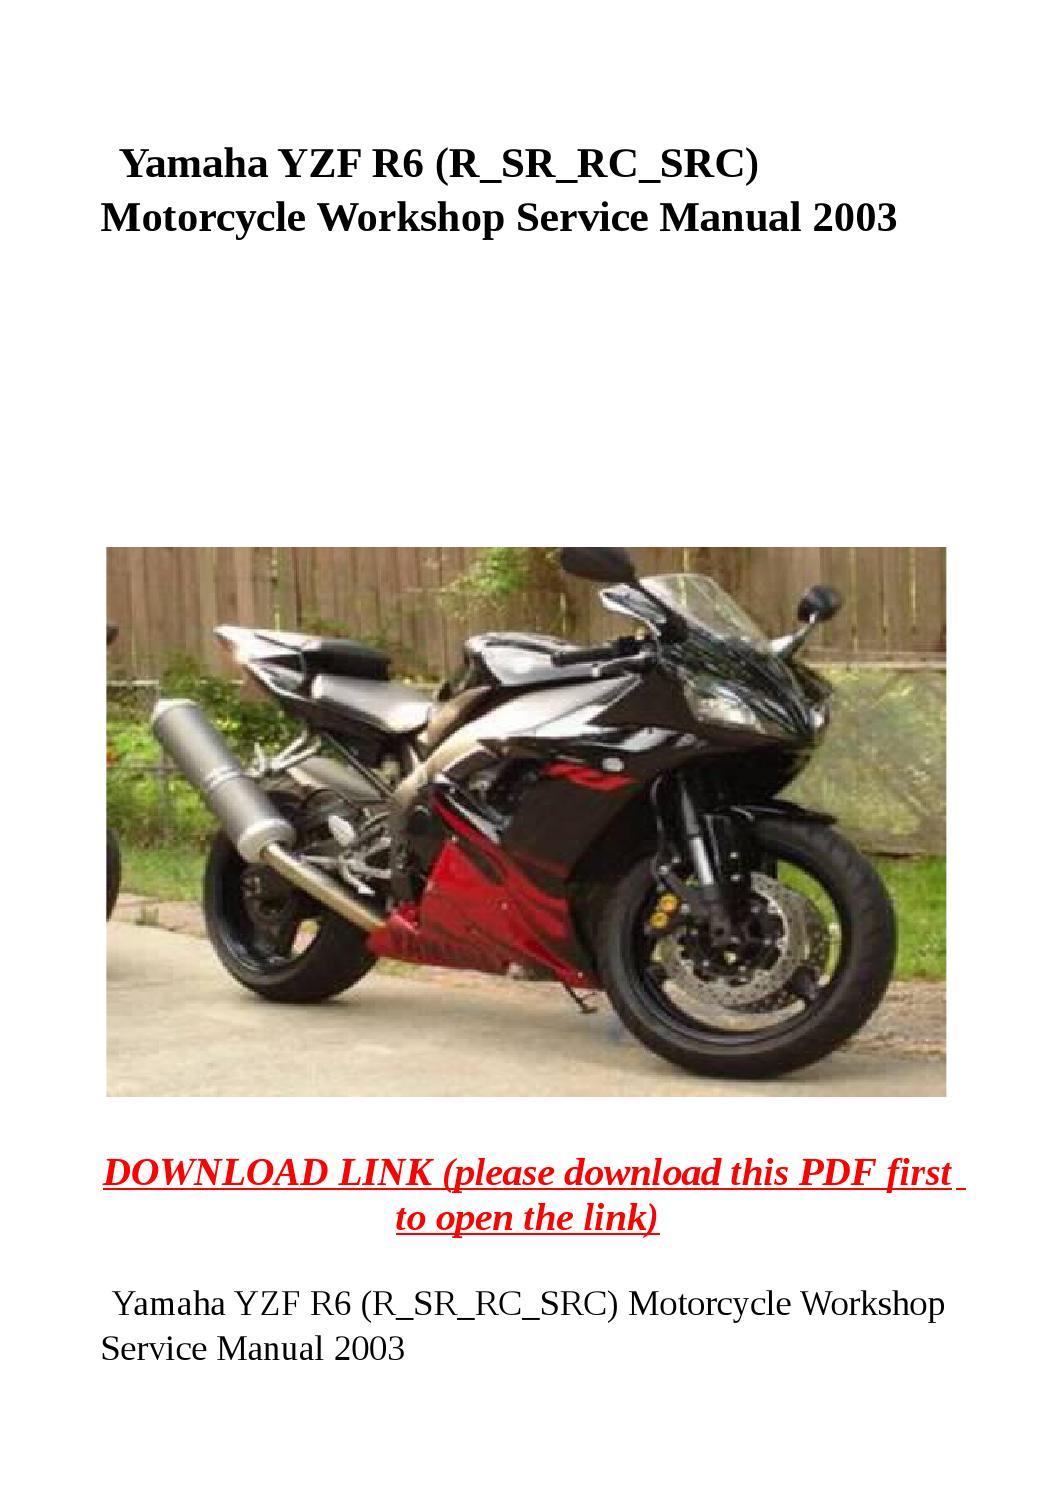 Yamaha workshop manuals for download free